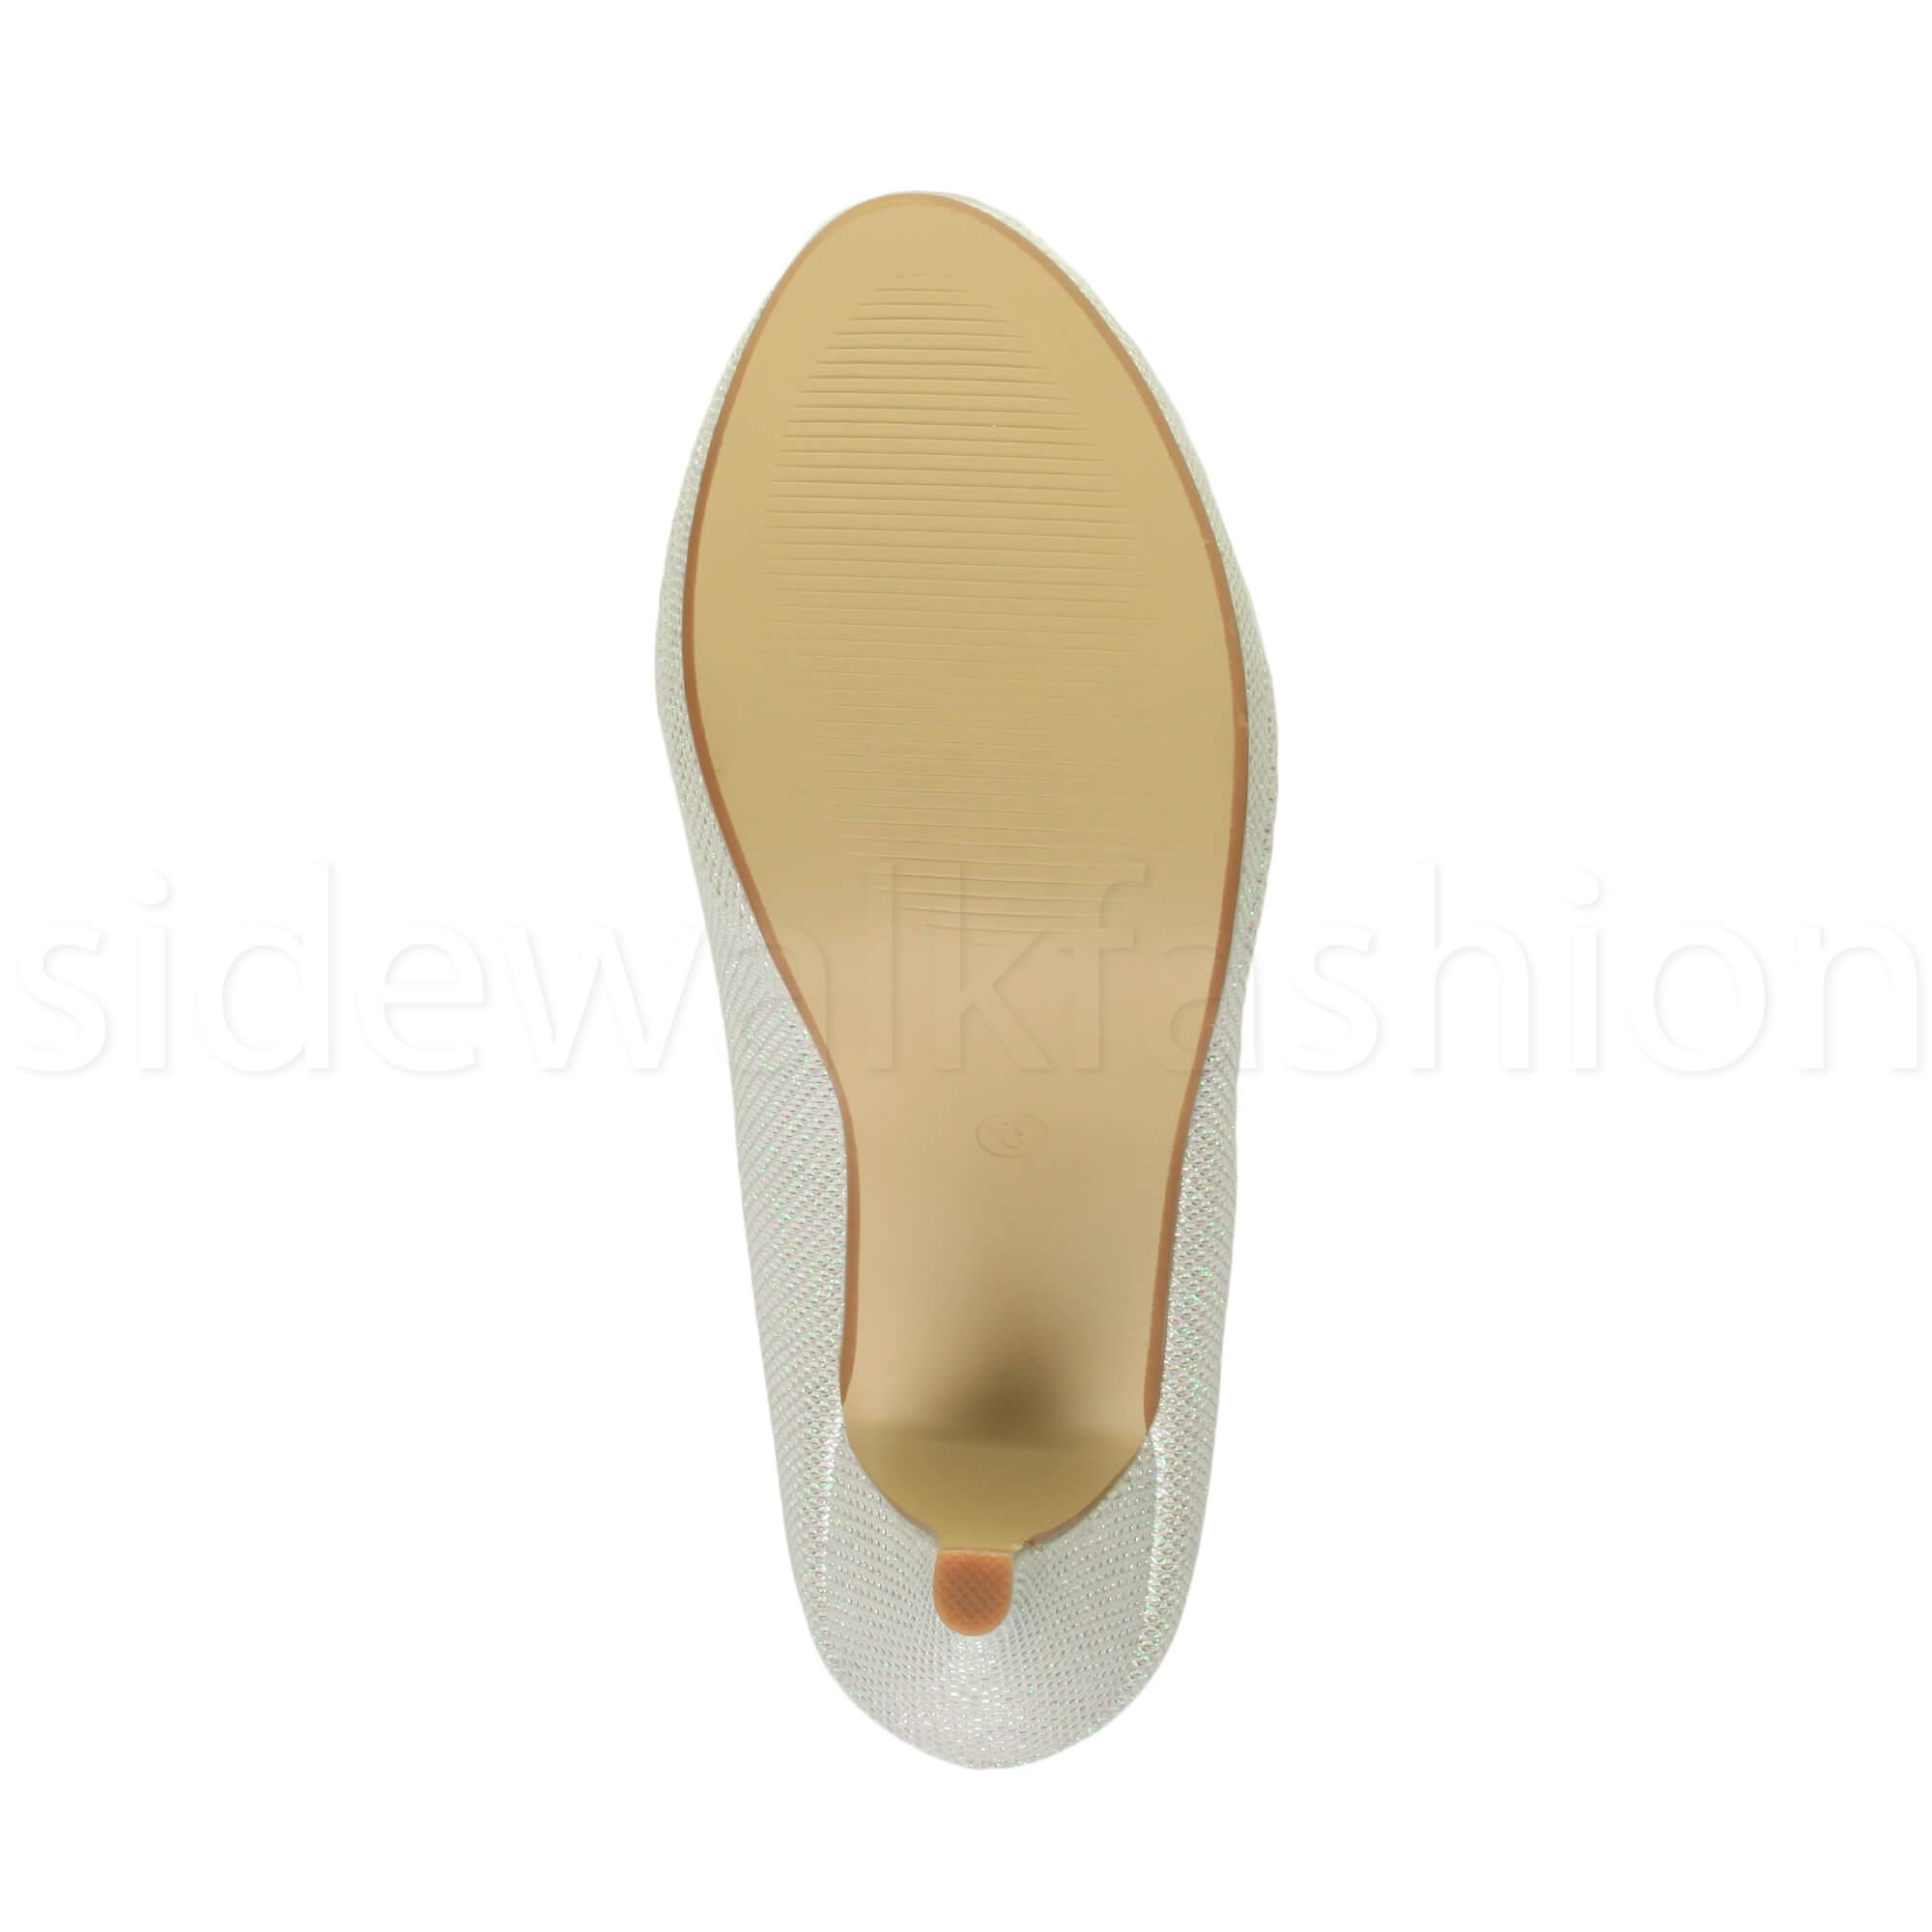 Womens-ladies-high-mid-heel-platform-wedding-evening-bridesmaid-court-shoes-size thumbnail 85